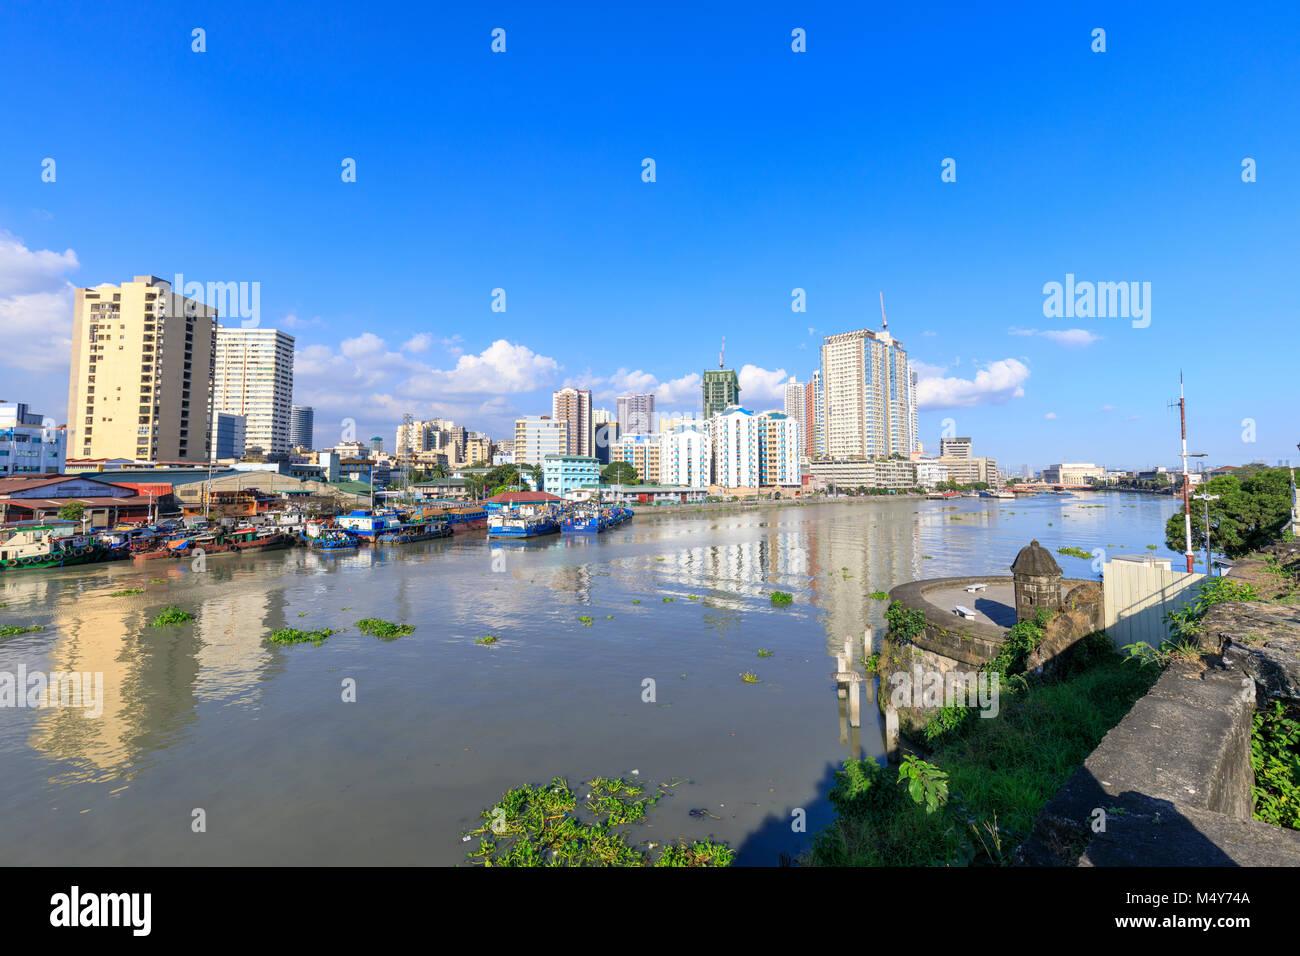 Manila, Philippines - Feb 17, 2018 : Manila pasig river view from Fort Santiago view deck, Intramuros, Manila, Philippines - Stock Image